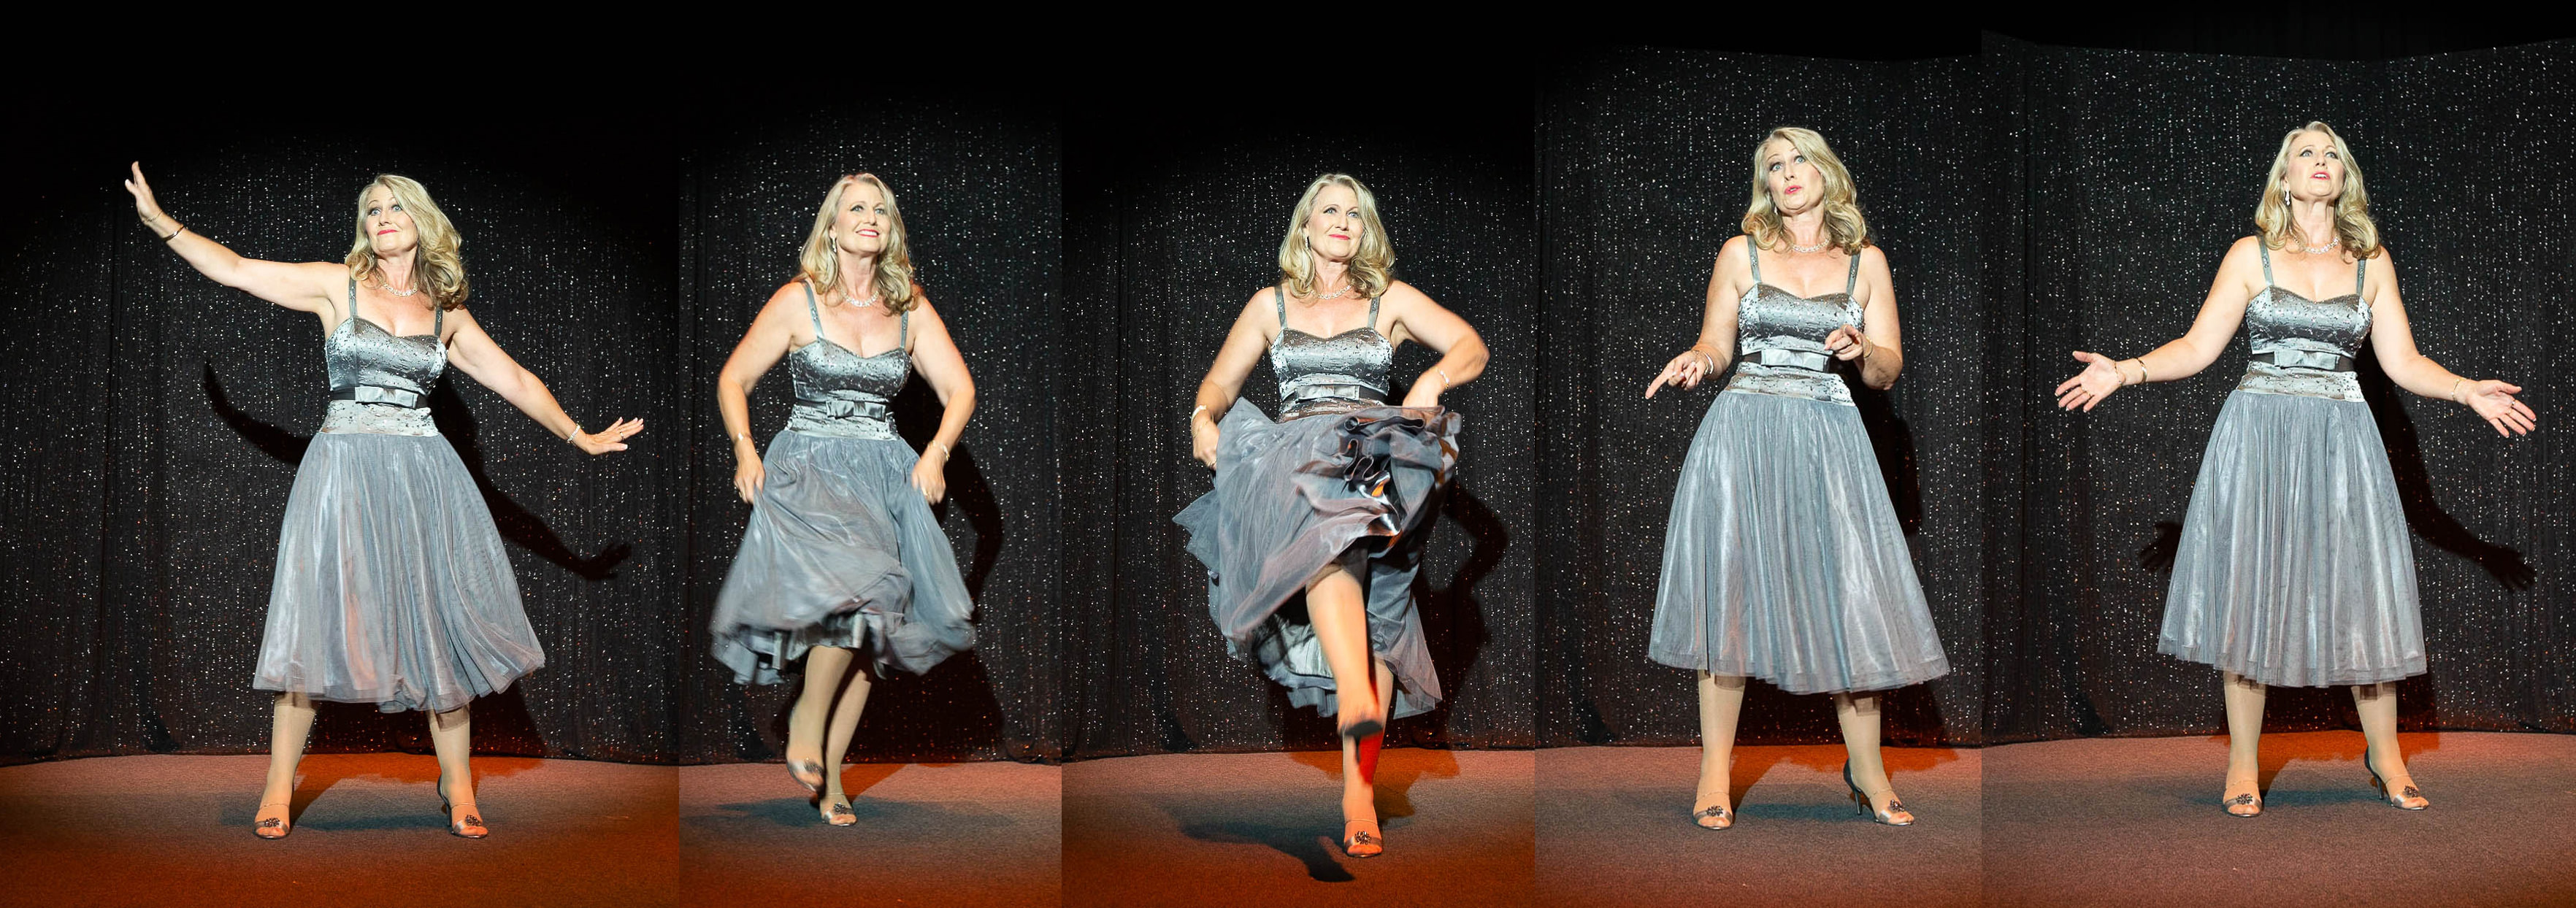 Photo of Jodi Ingram singing and dancing. Photo by Car Telfer, Photographer